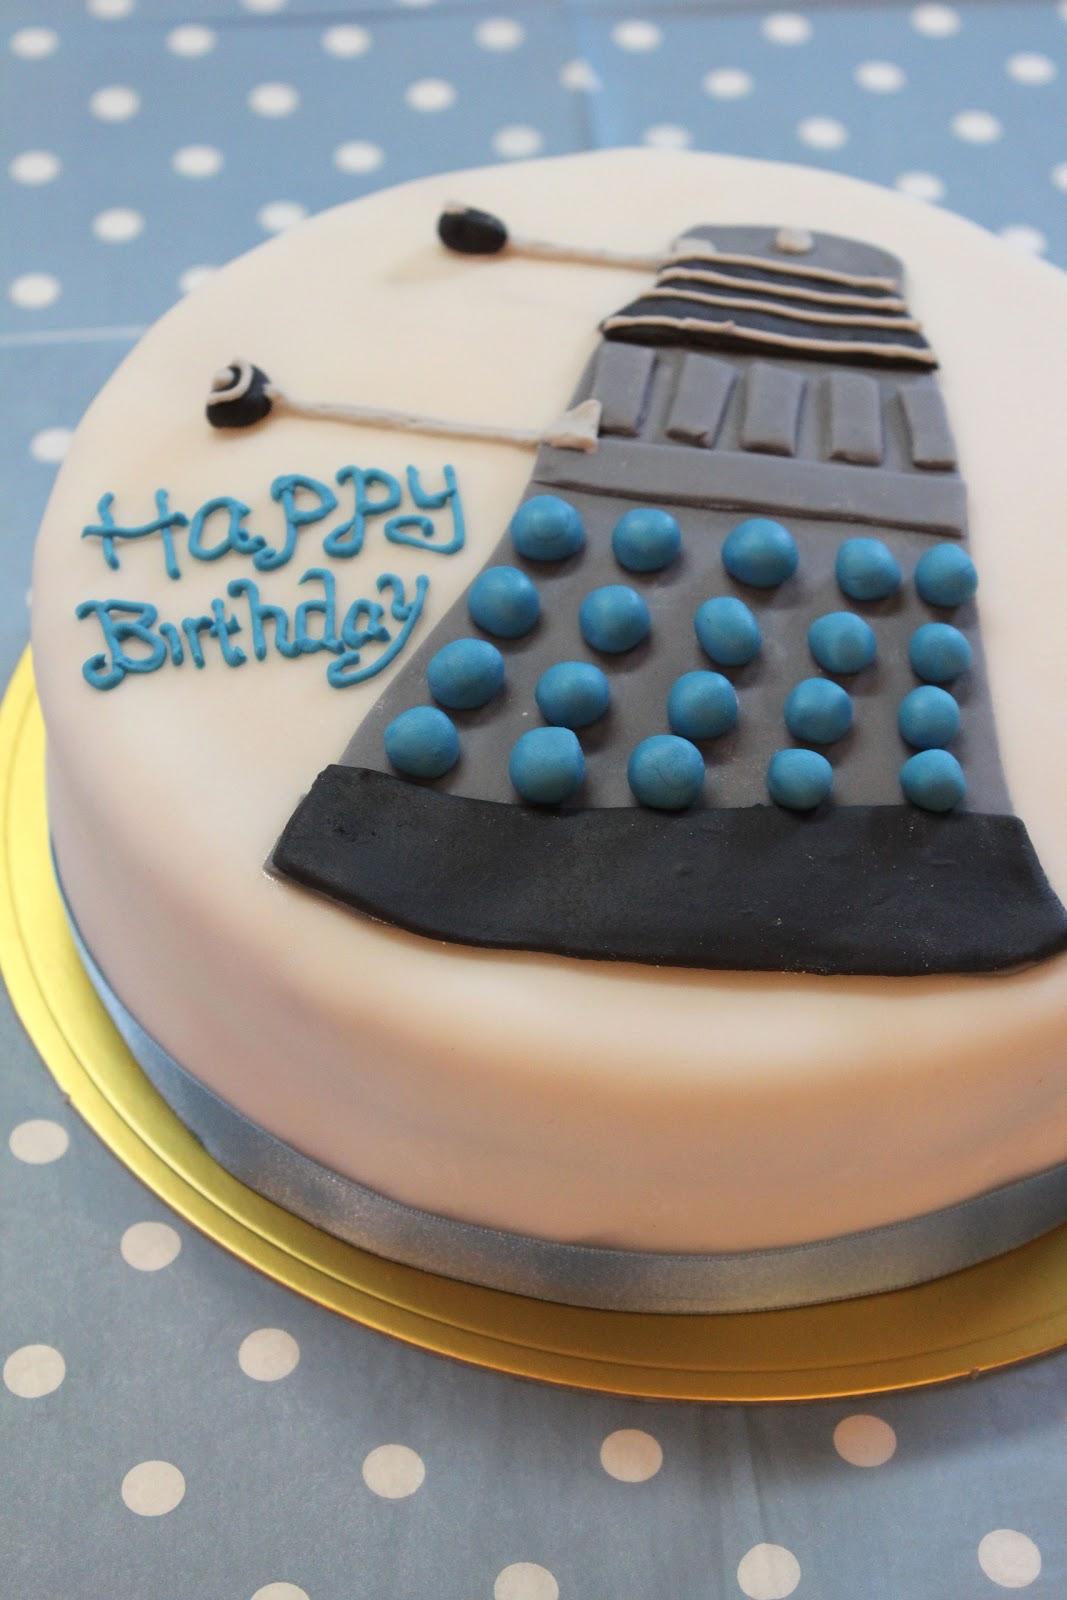 Tortelicious Drwho Birthday Cake